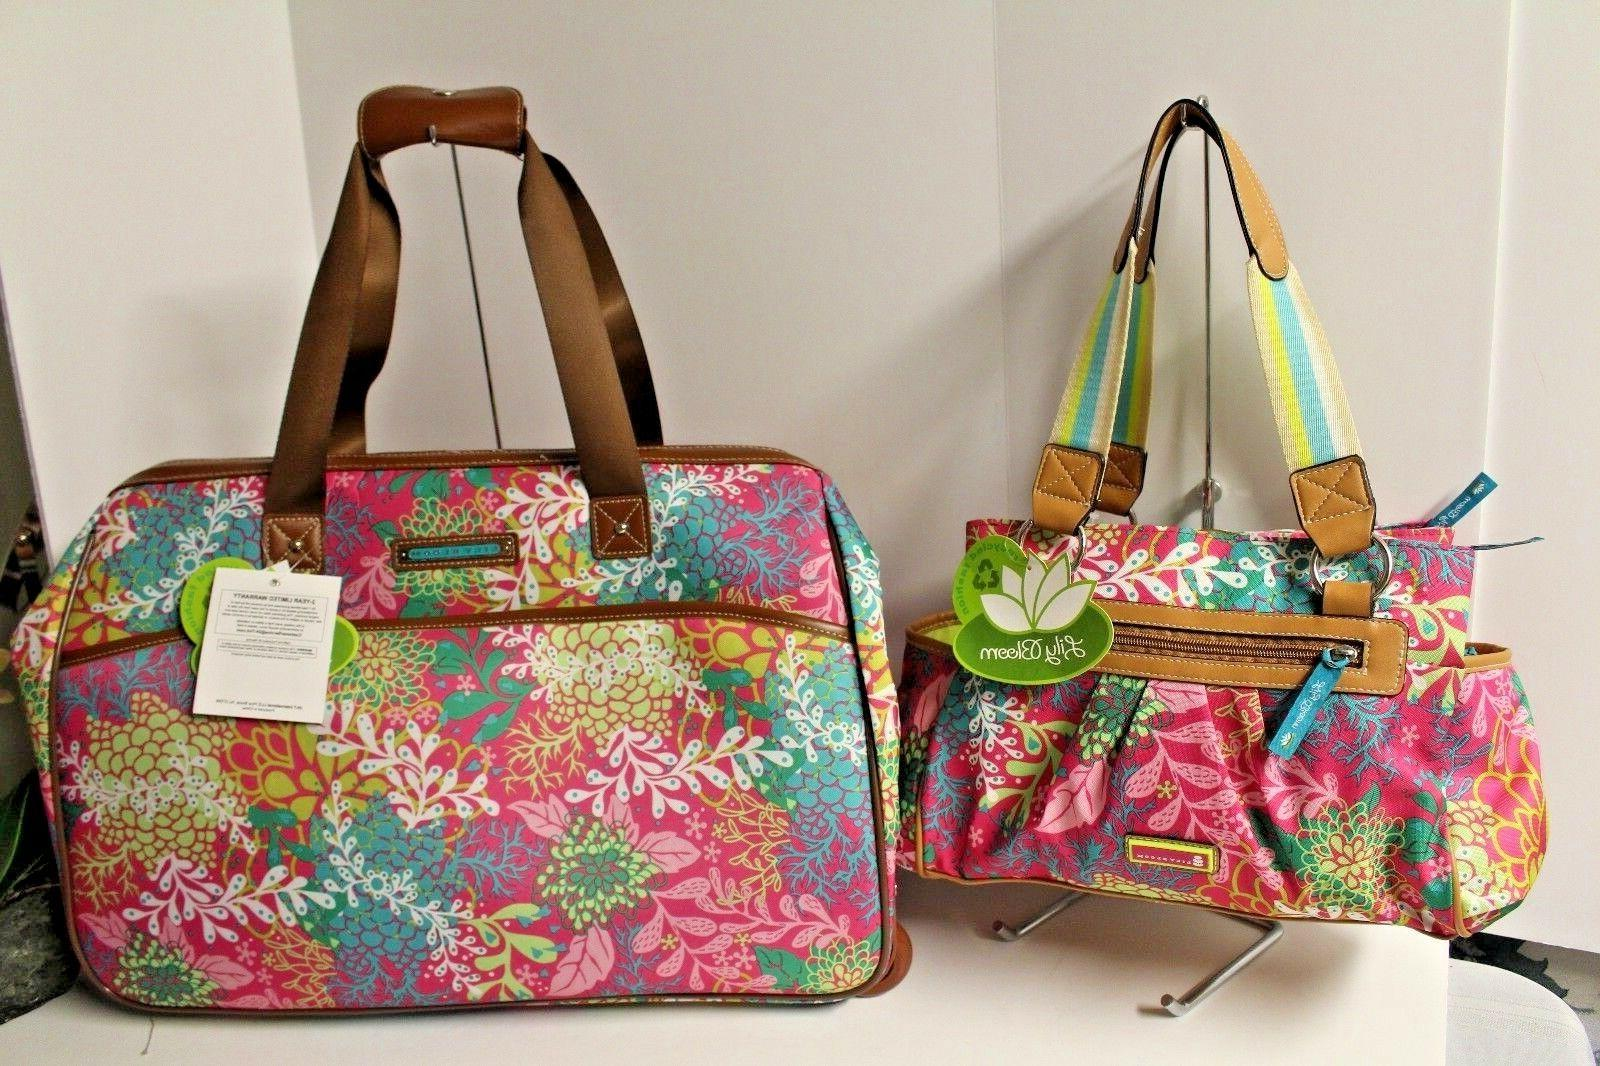 luggage designer pattern suitcase wheeled duffel carry